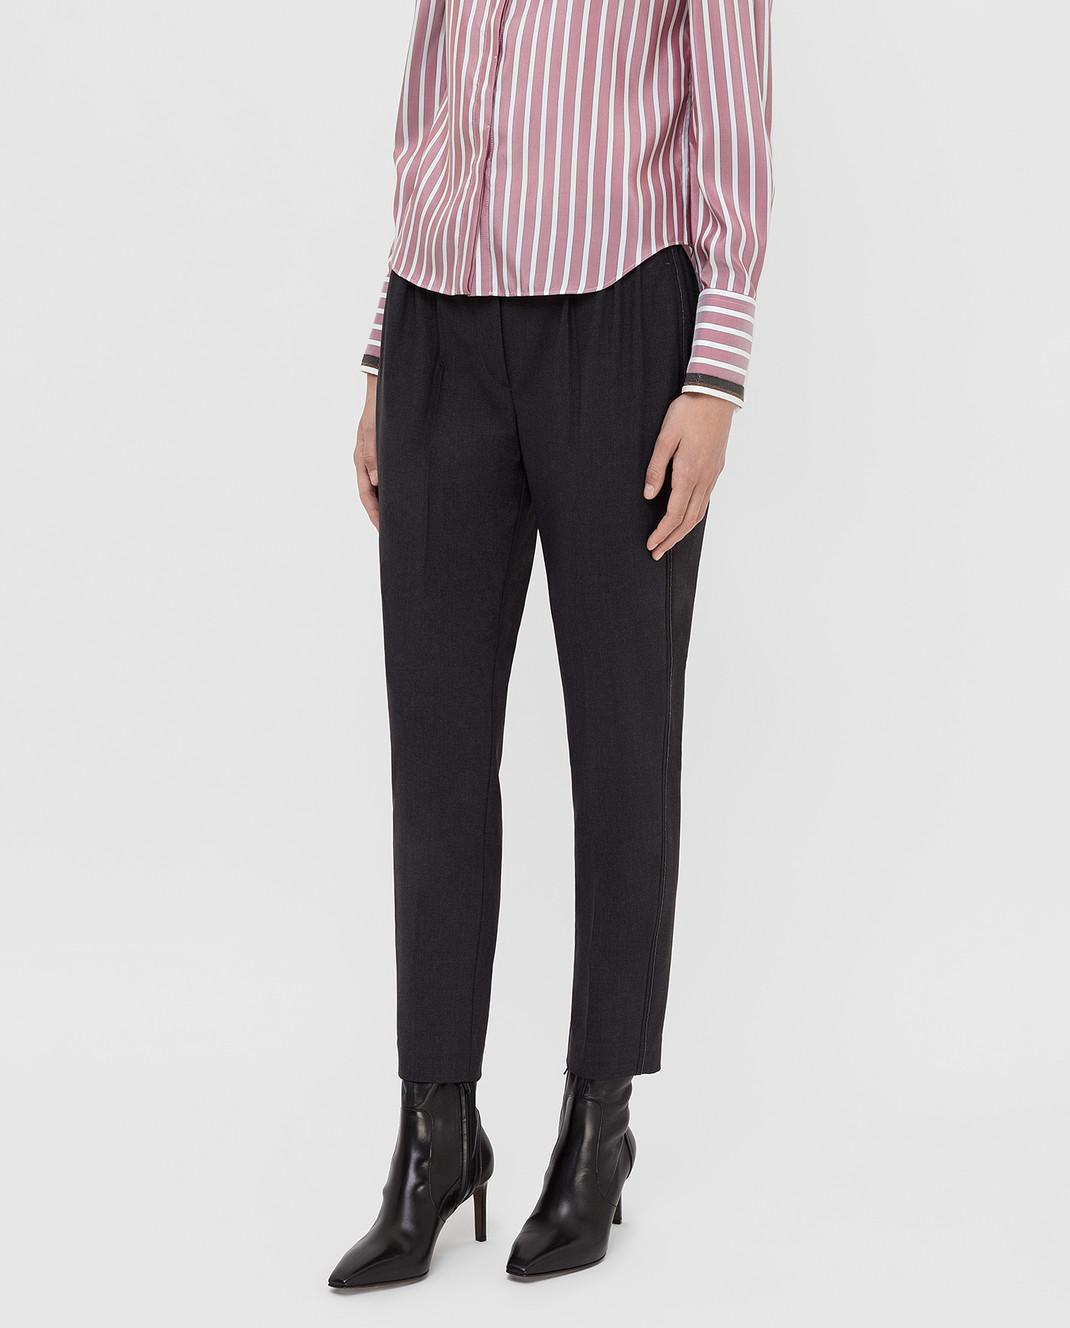 Brunello Cucinelli Темно-серые брюки из шерсти M0W07P6818 изображение 3